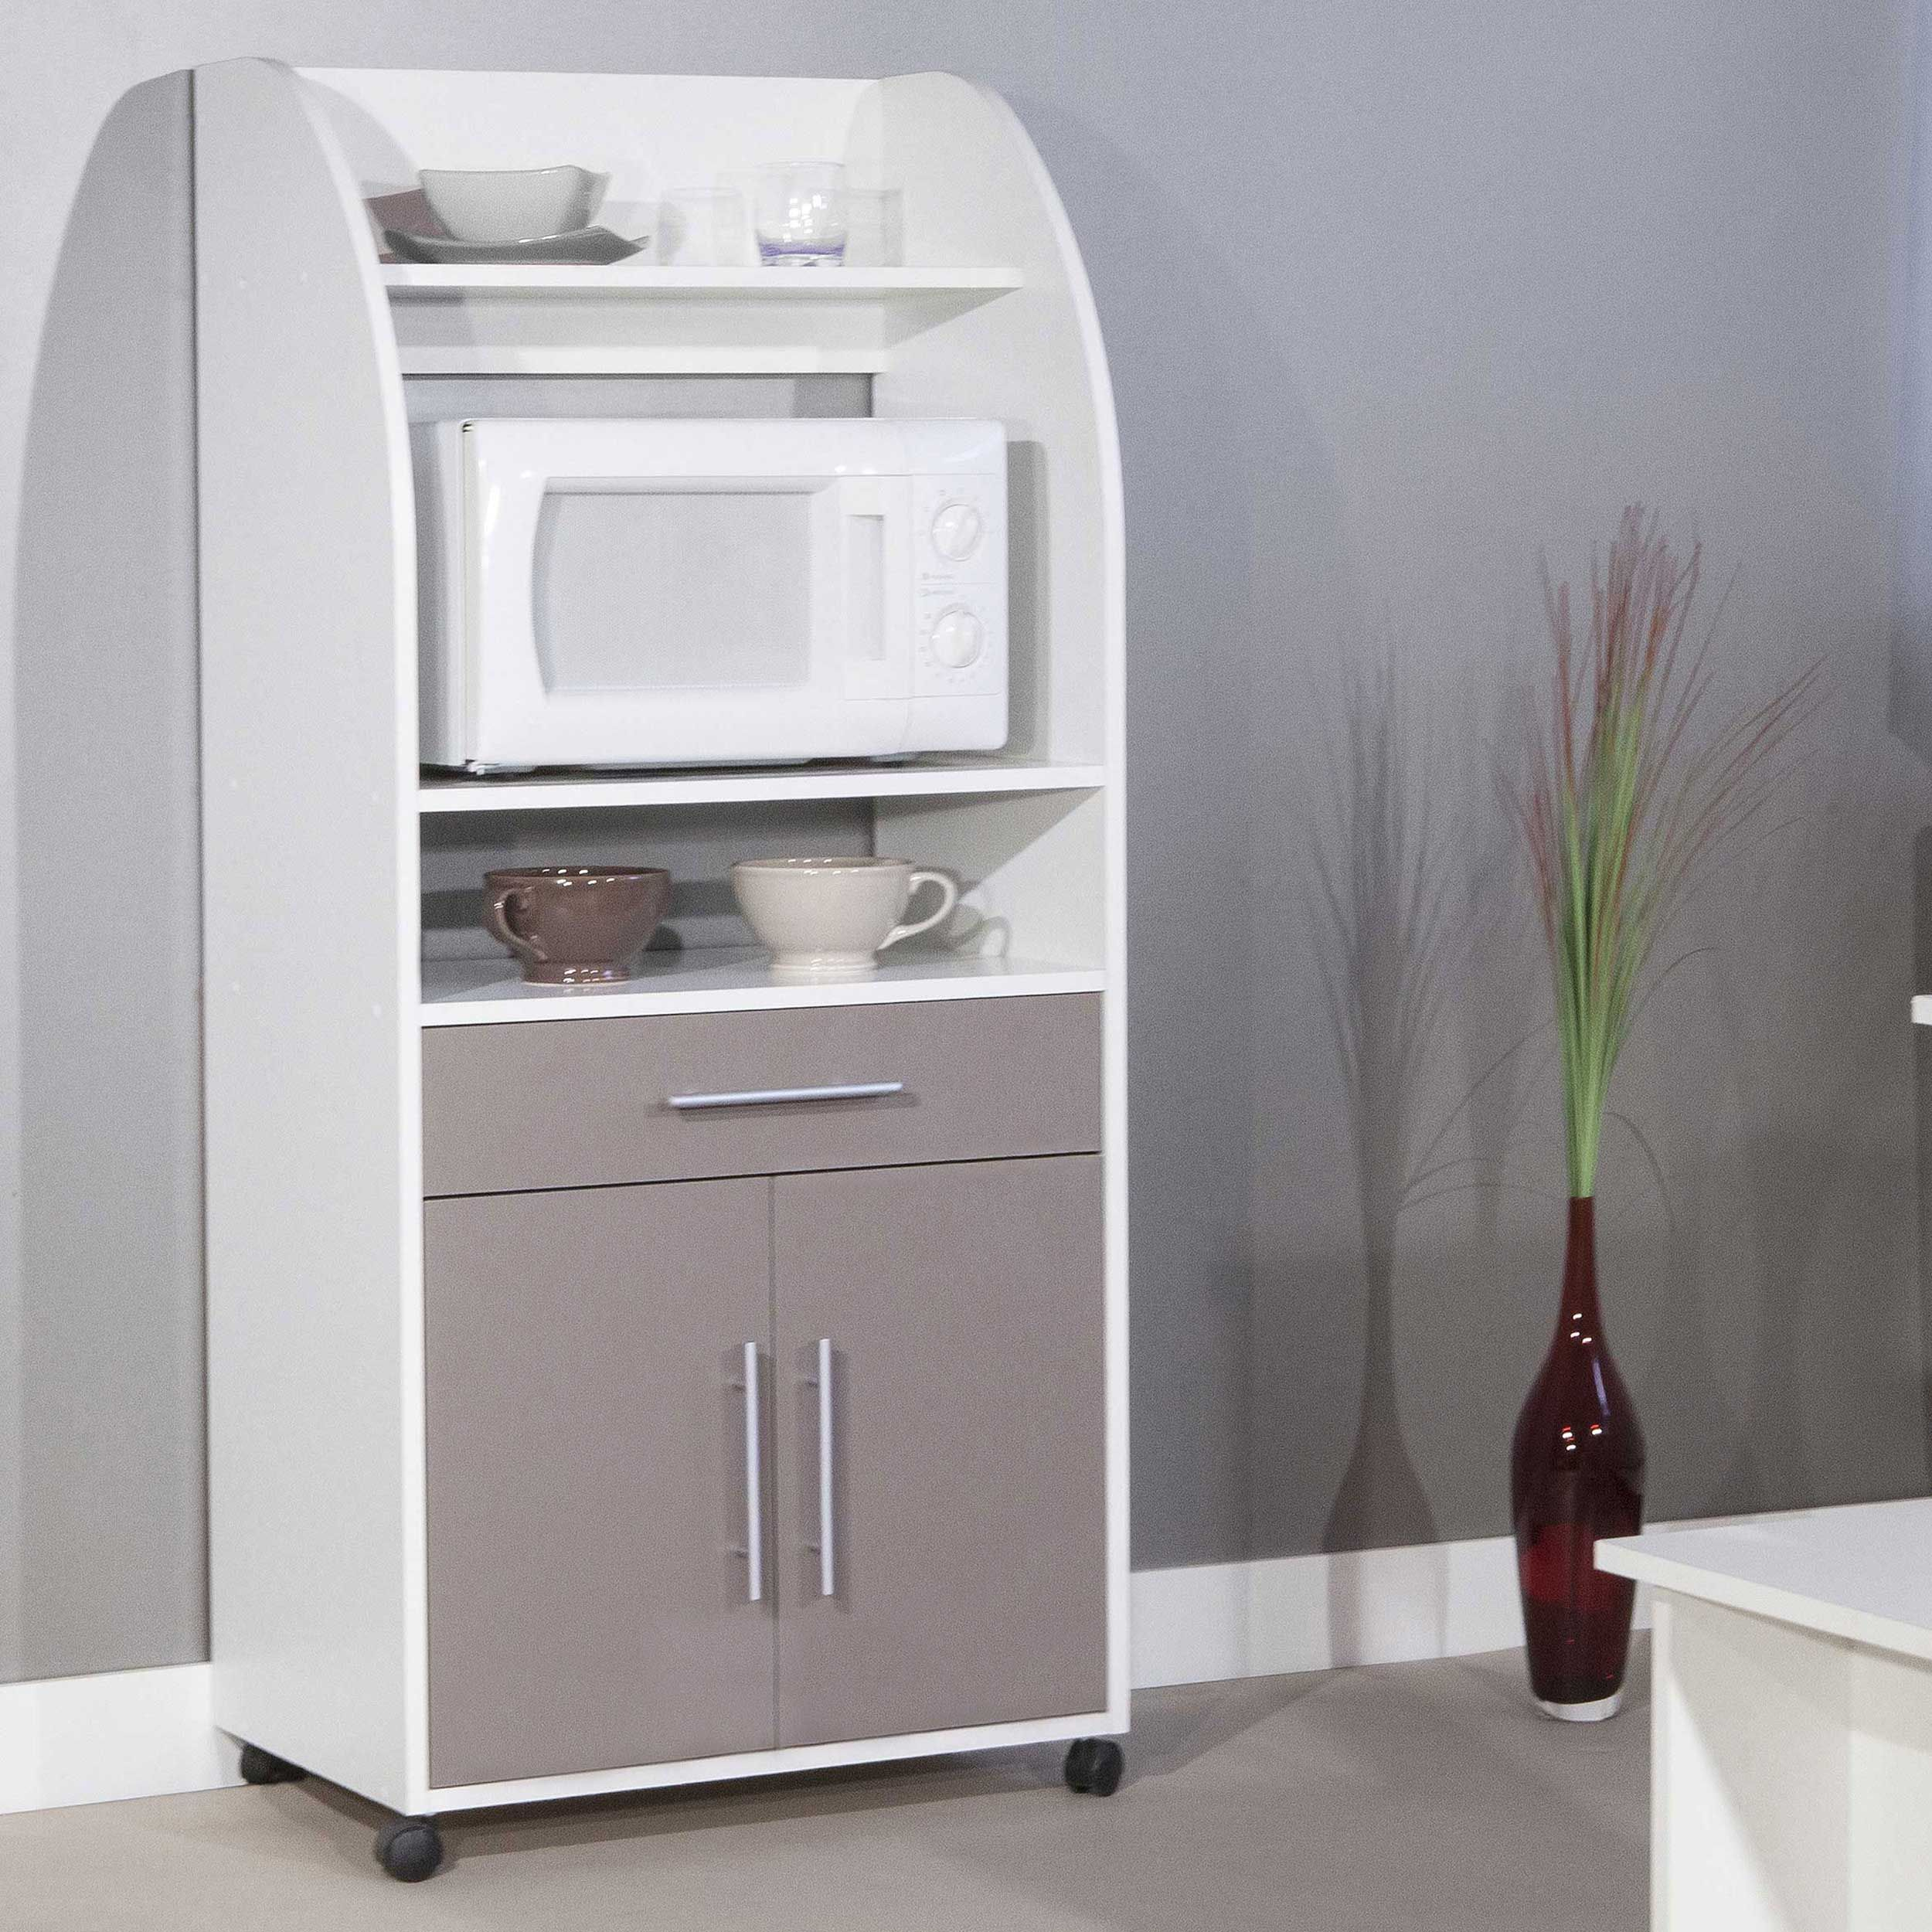 Meuble Micro Onde Et Four armoire d'appoint jeanne pour four à micro-ondes - blanc/taupe